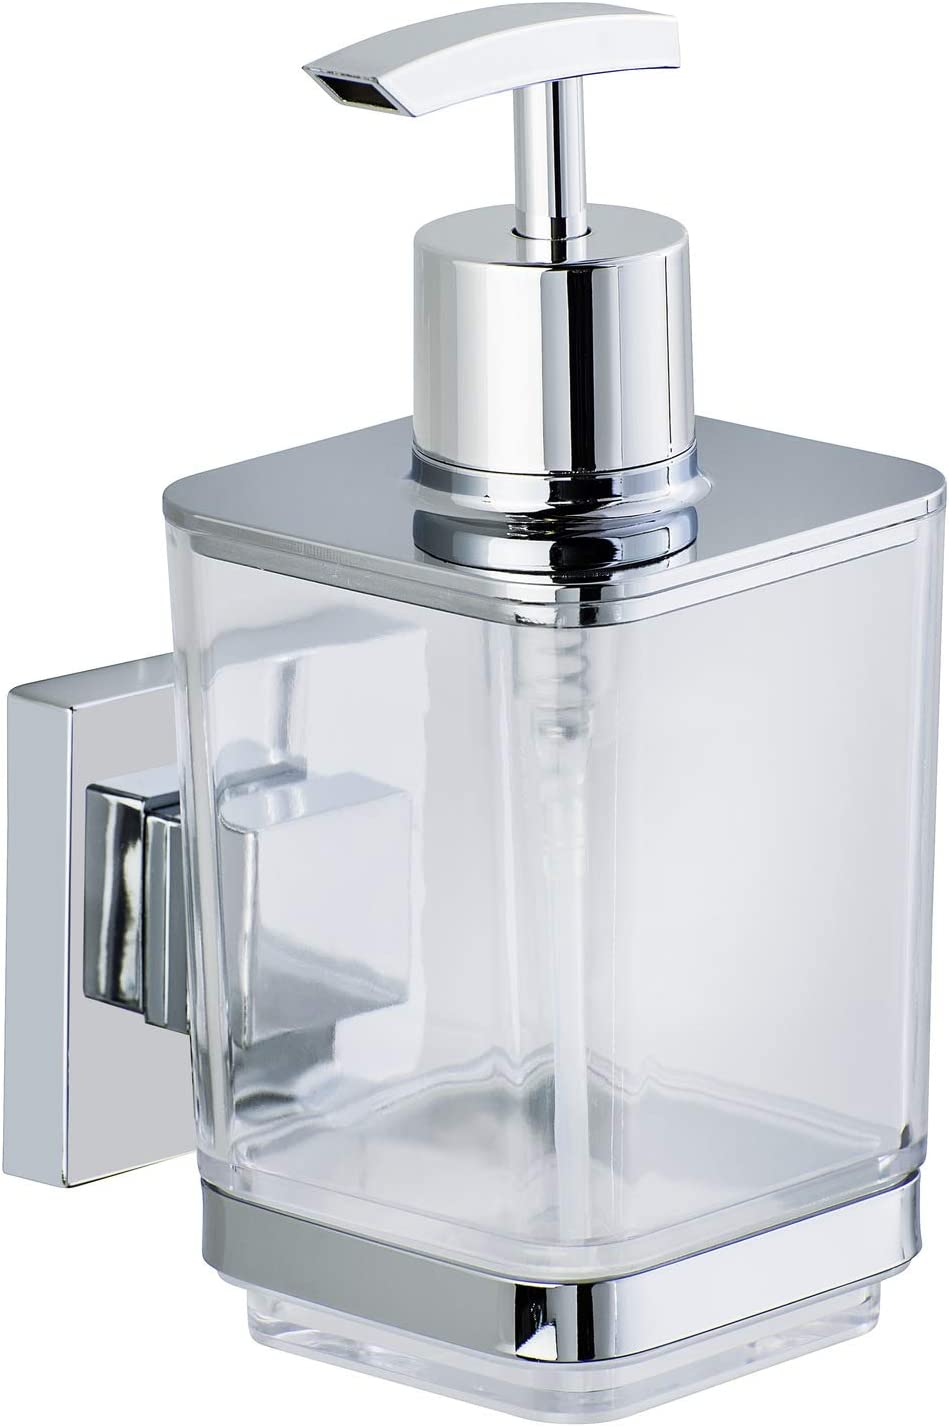 Wenko Vacuum-Loc soap Dispenser Quadro, Stainless Steel, Silver Shiny, 7.5 x 10 x 16 cm